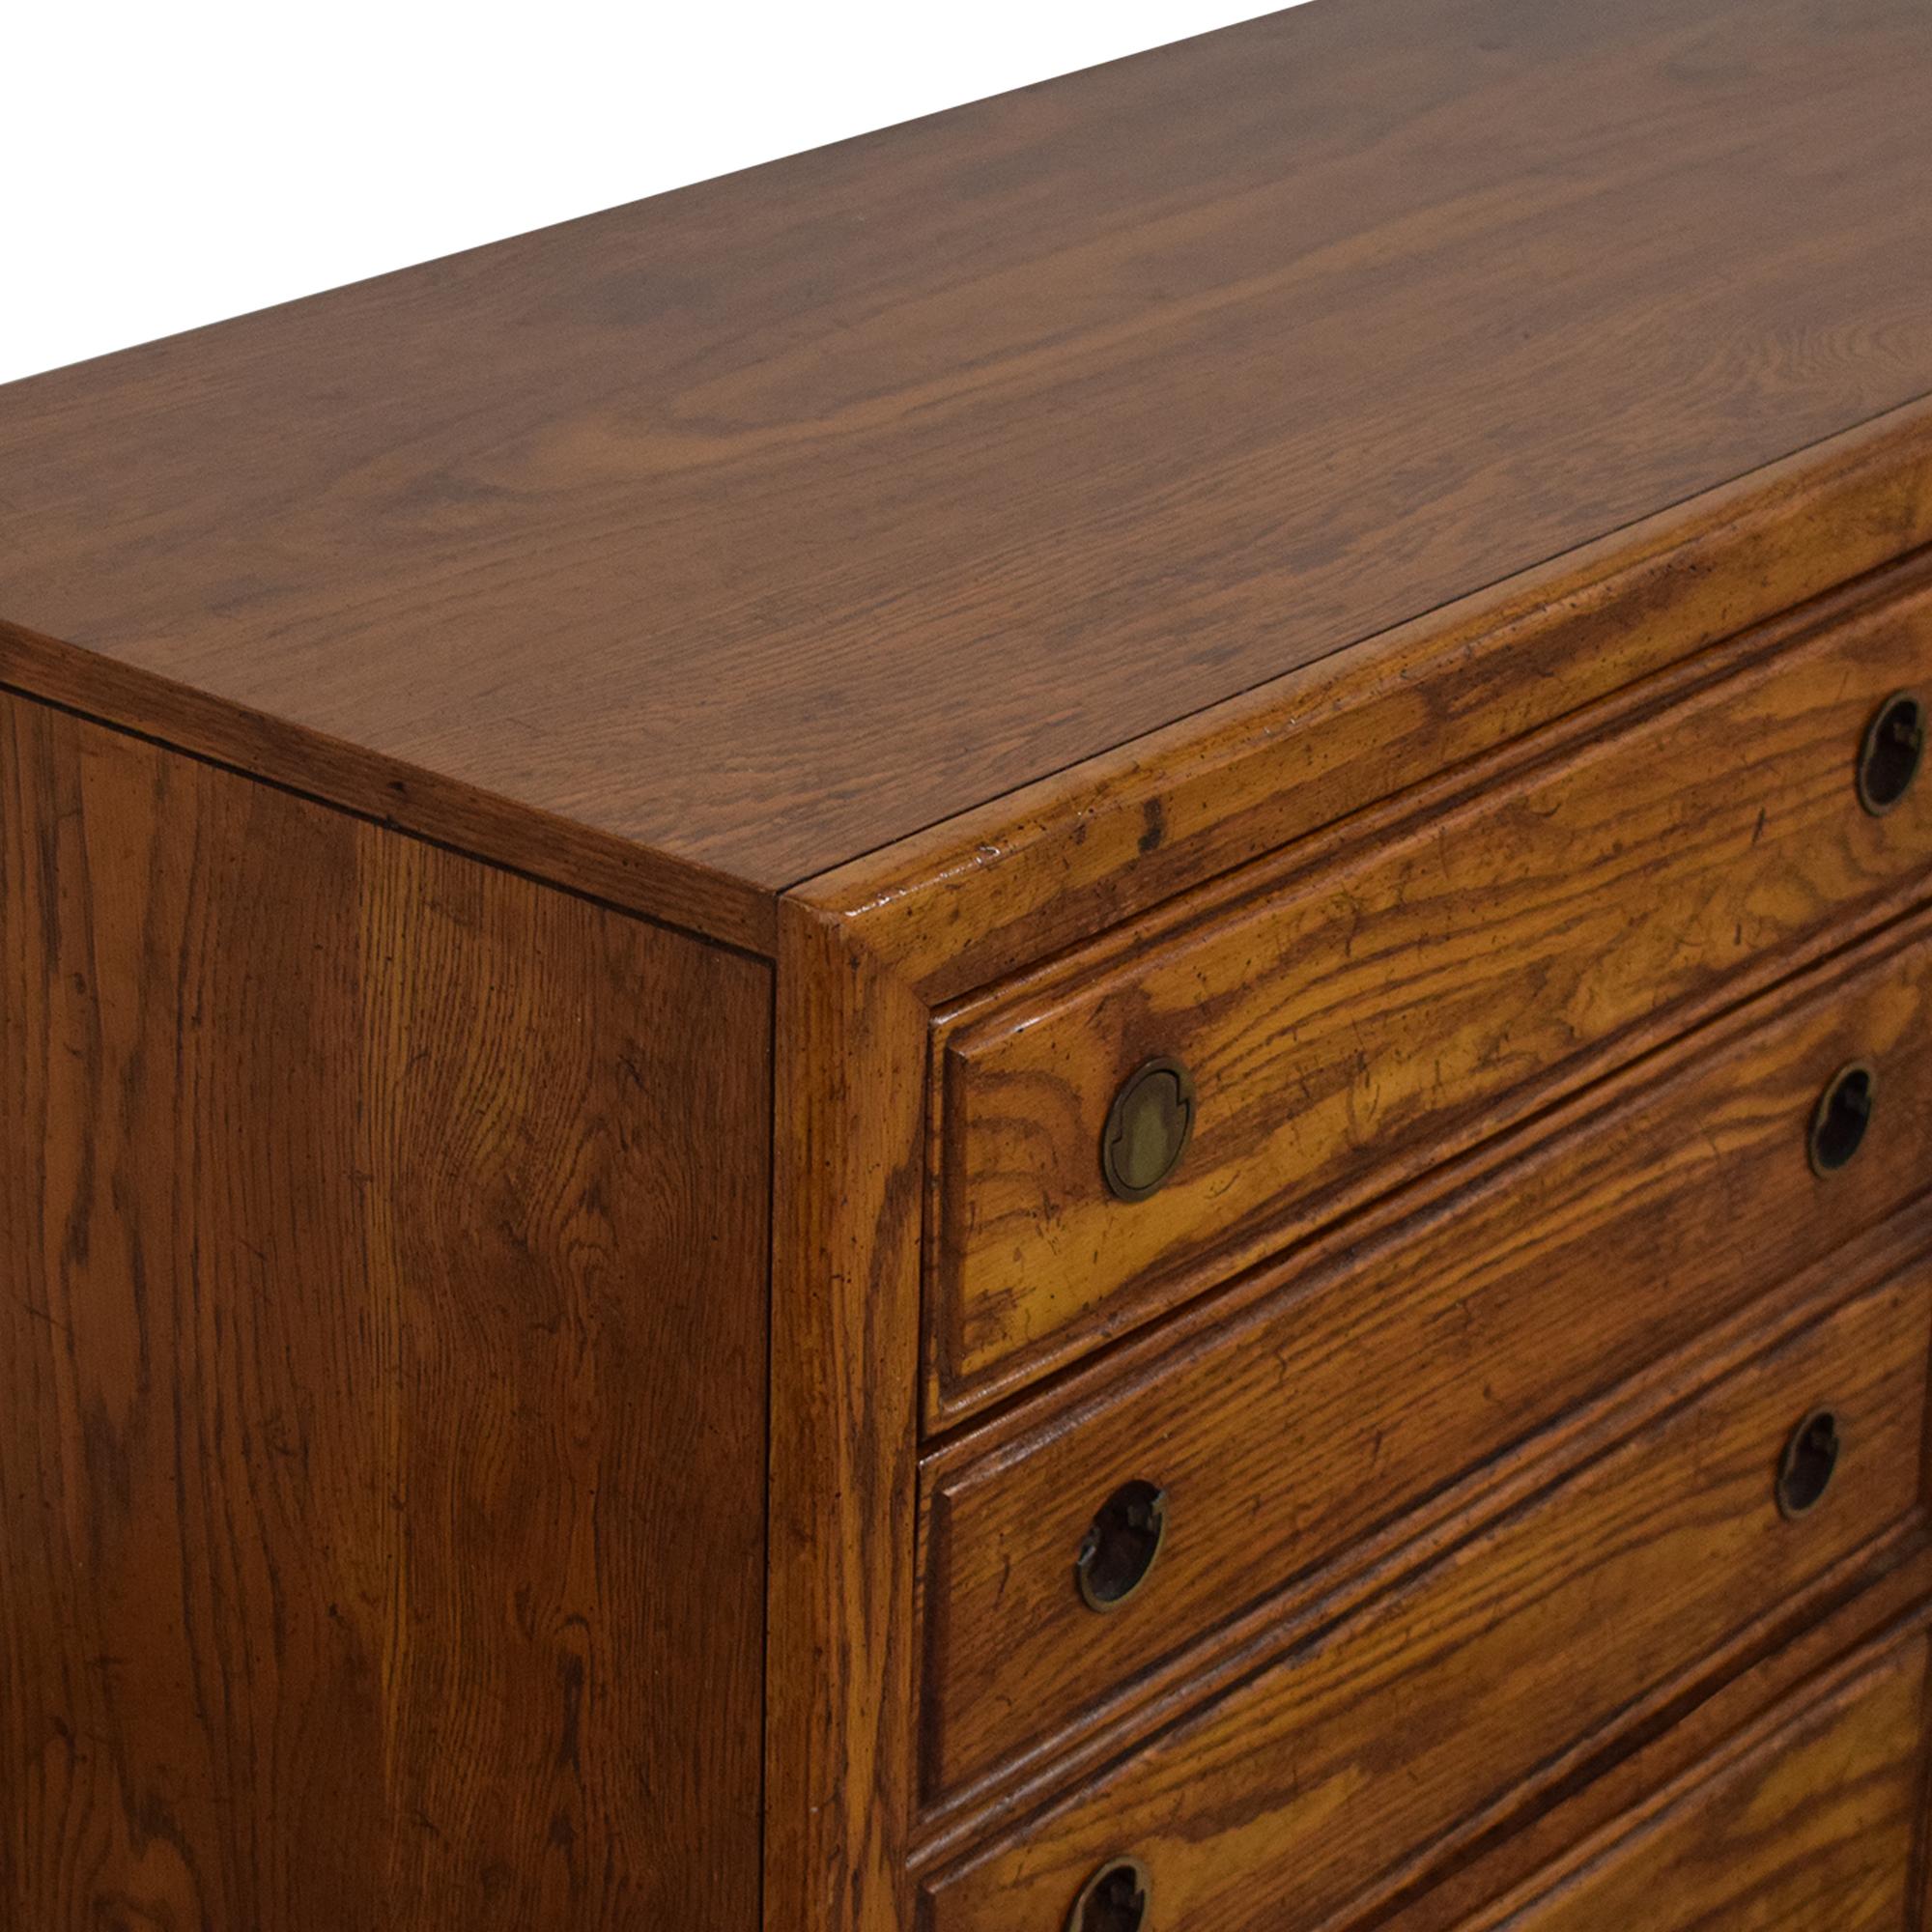 Thomasville Thomasville Vintage Dresser price